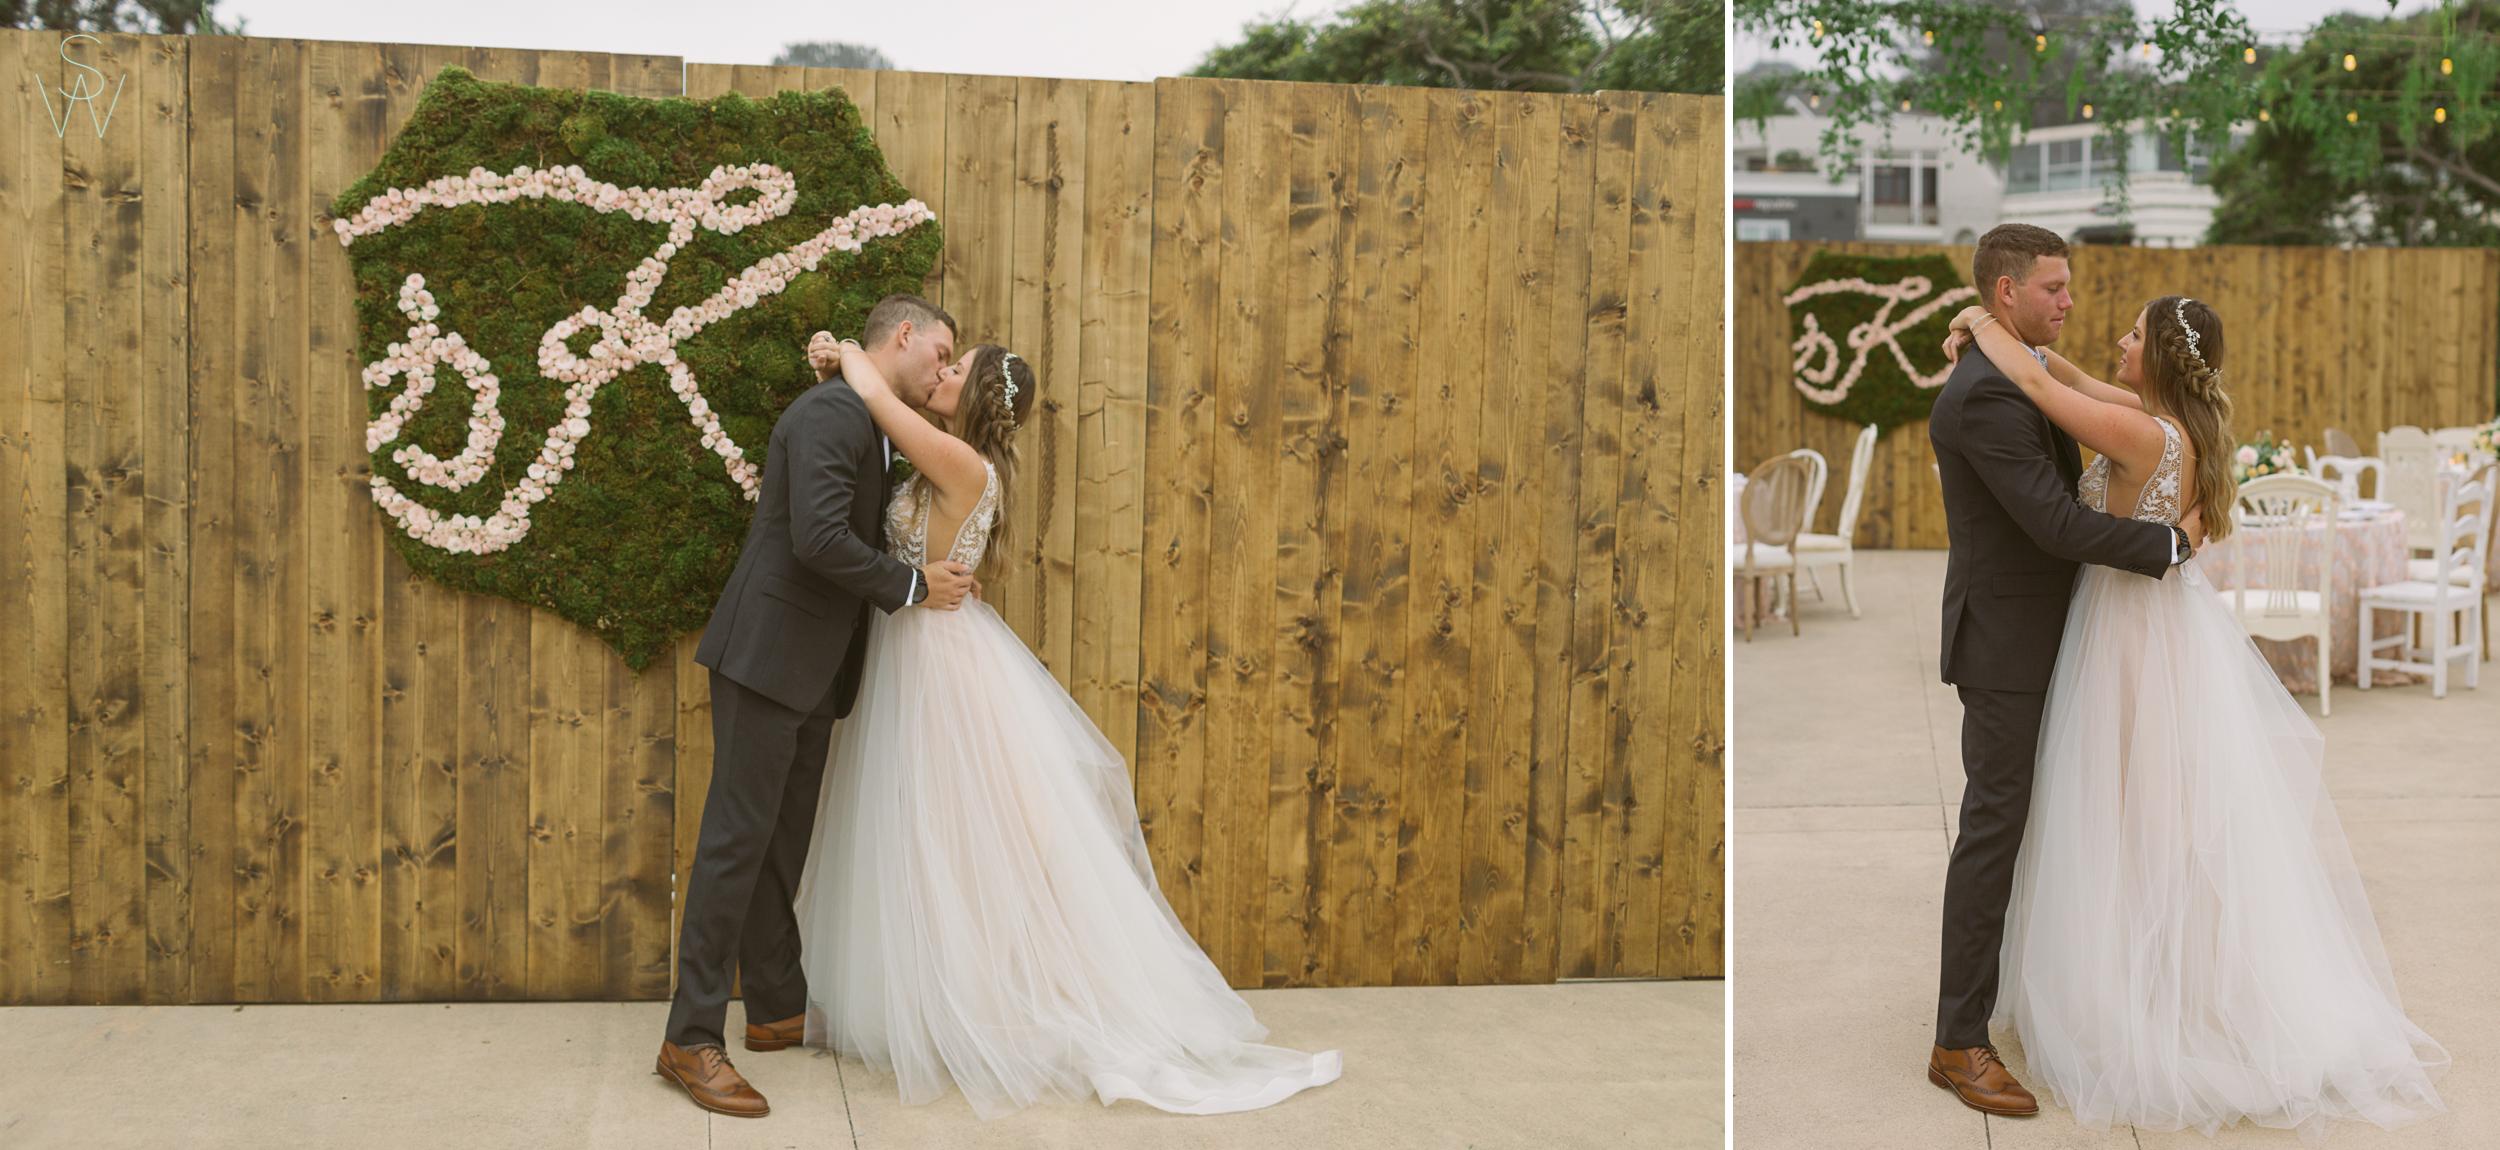 210Lauberge.shewanders.wedding.romantics.portraits.photography.JPG